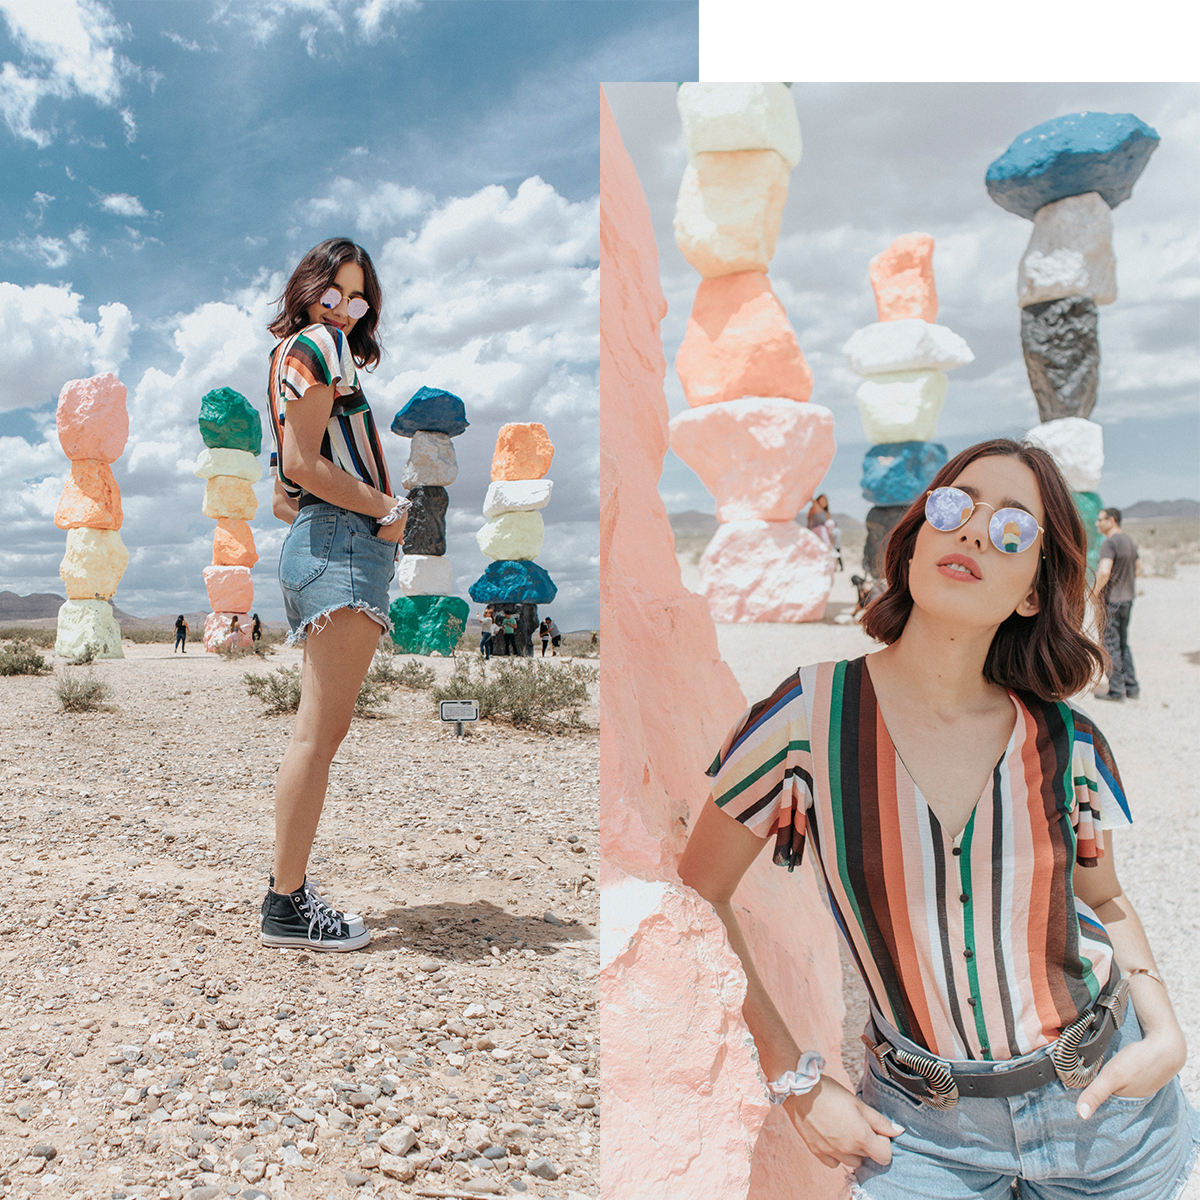 Seven Magic Mountains – Las Vegas, NV